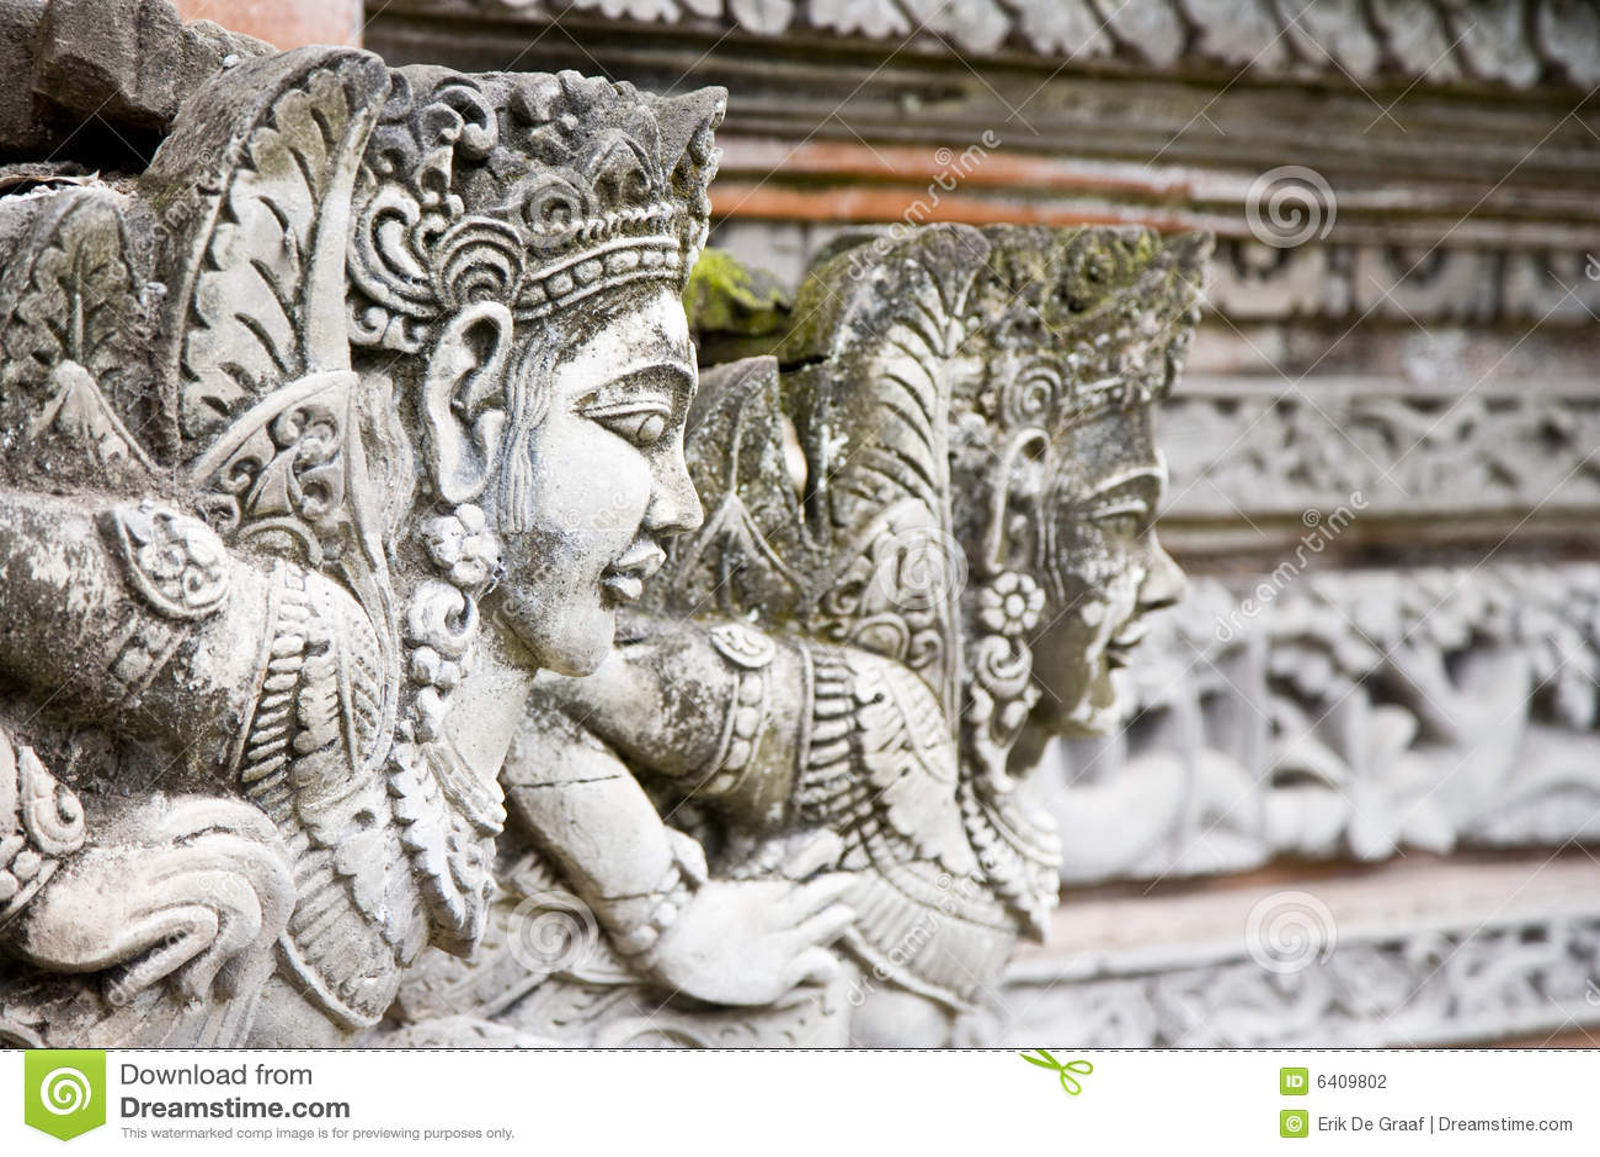 Bali rzeźby